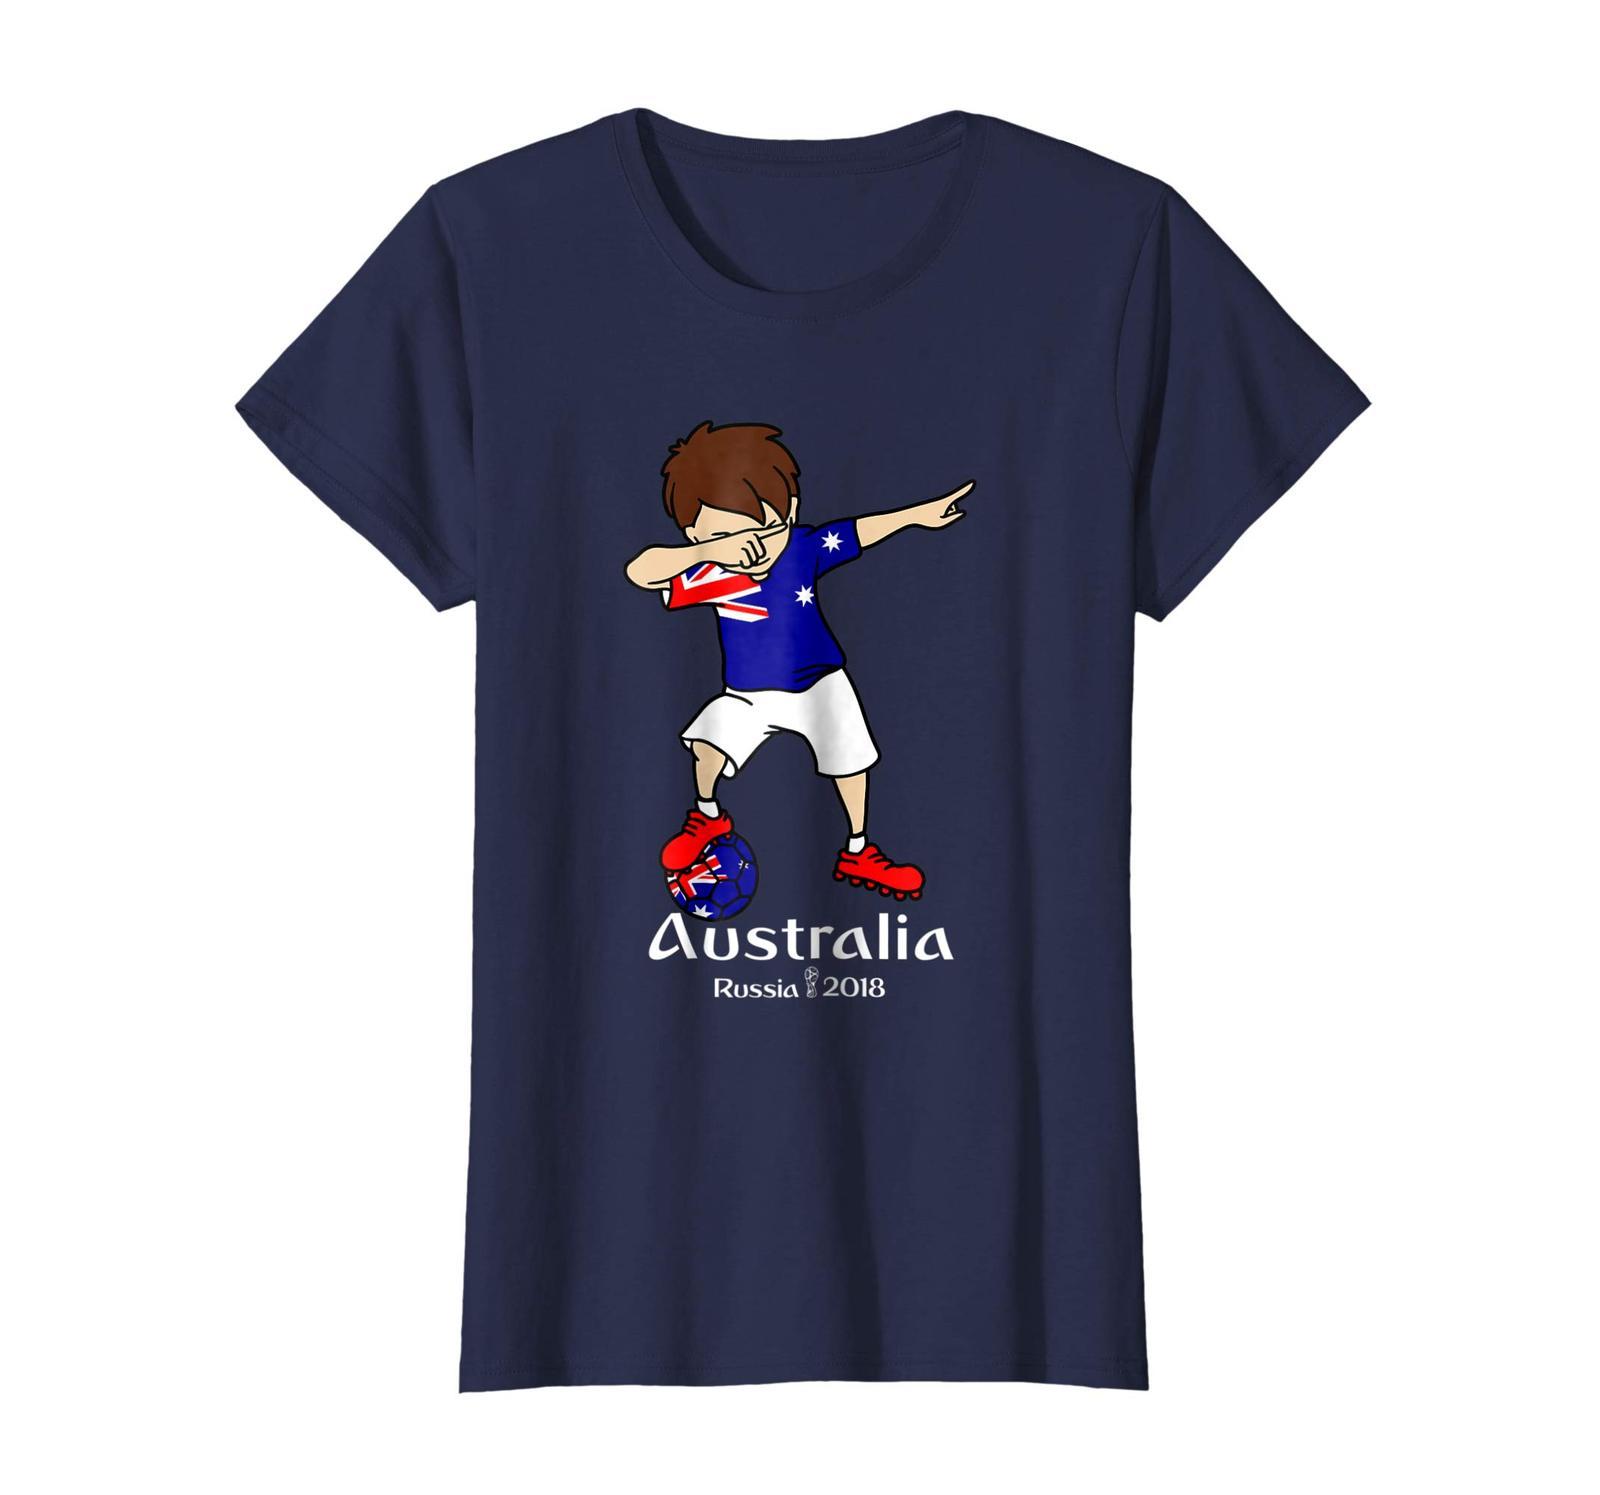 New Shirts - Funny Dabbing Soccer Boy Australia T Shirt - Football Gift Wowen image 4